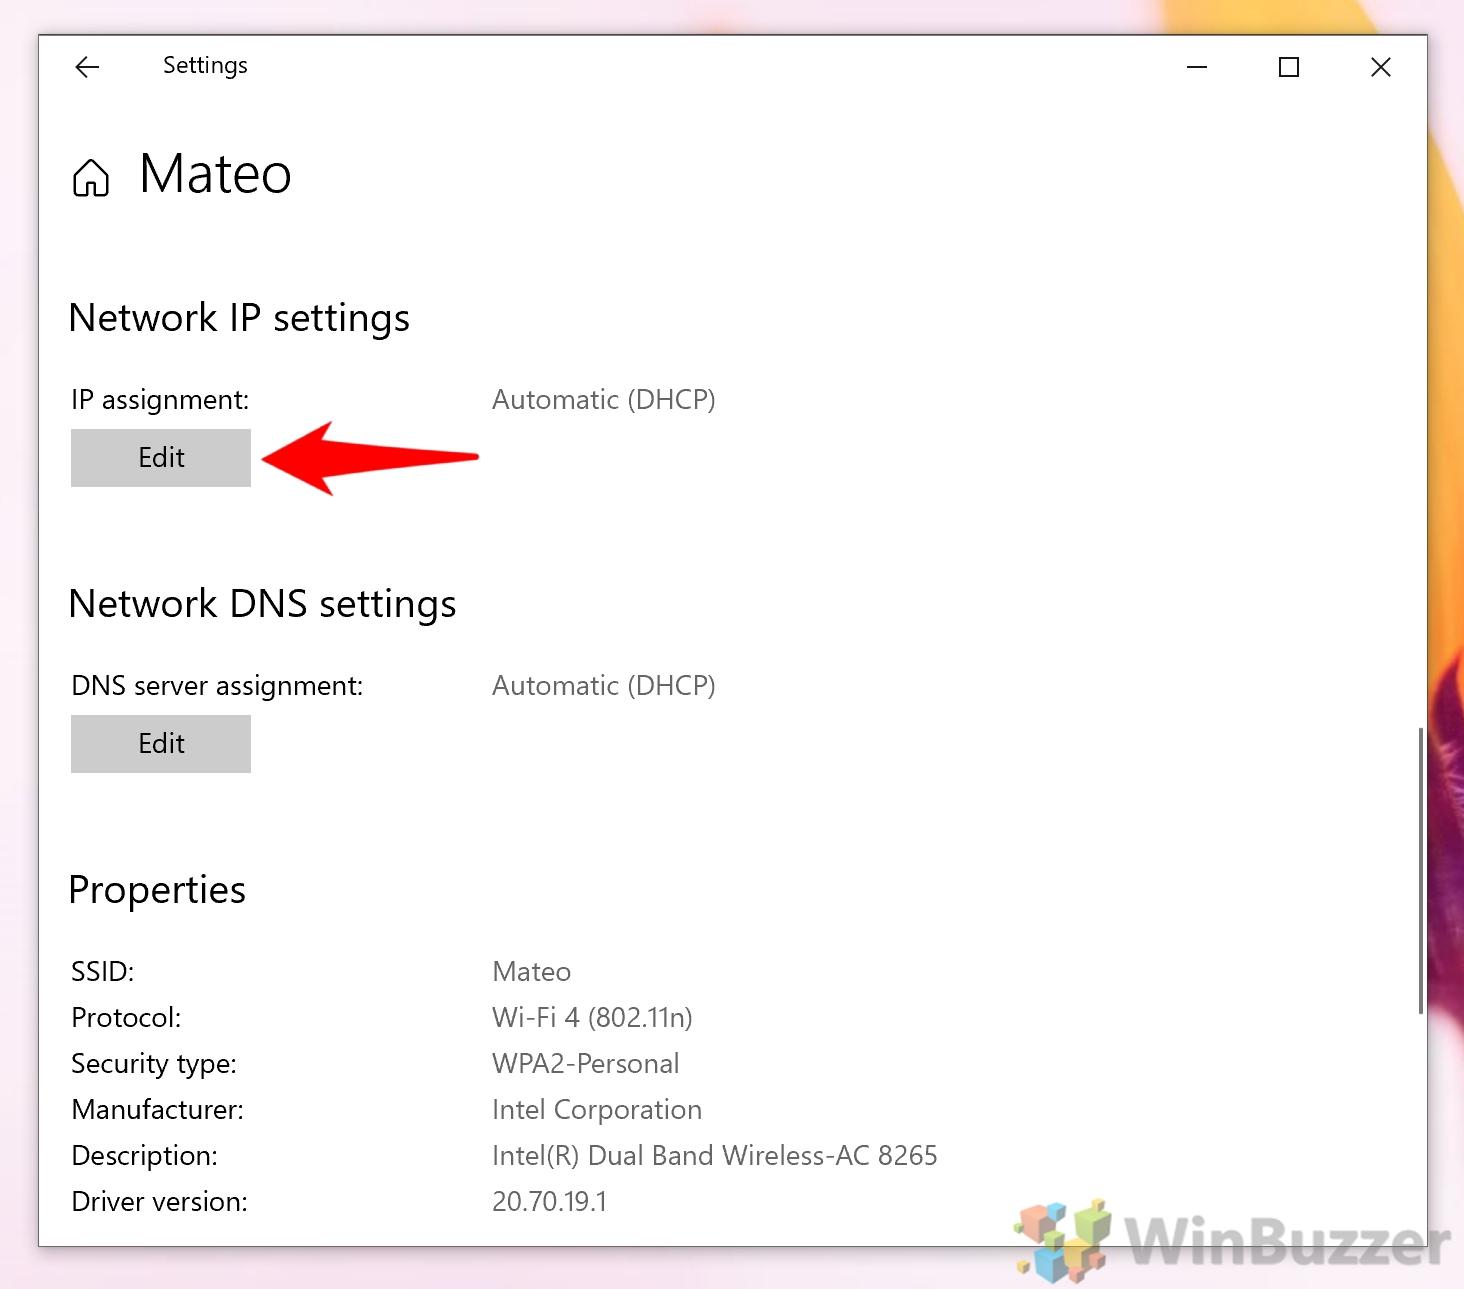 Windows 10 - Settings - Network & Internet - Wifi - Edit IP Assignment